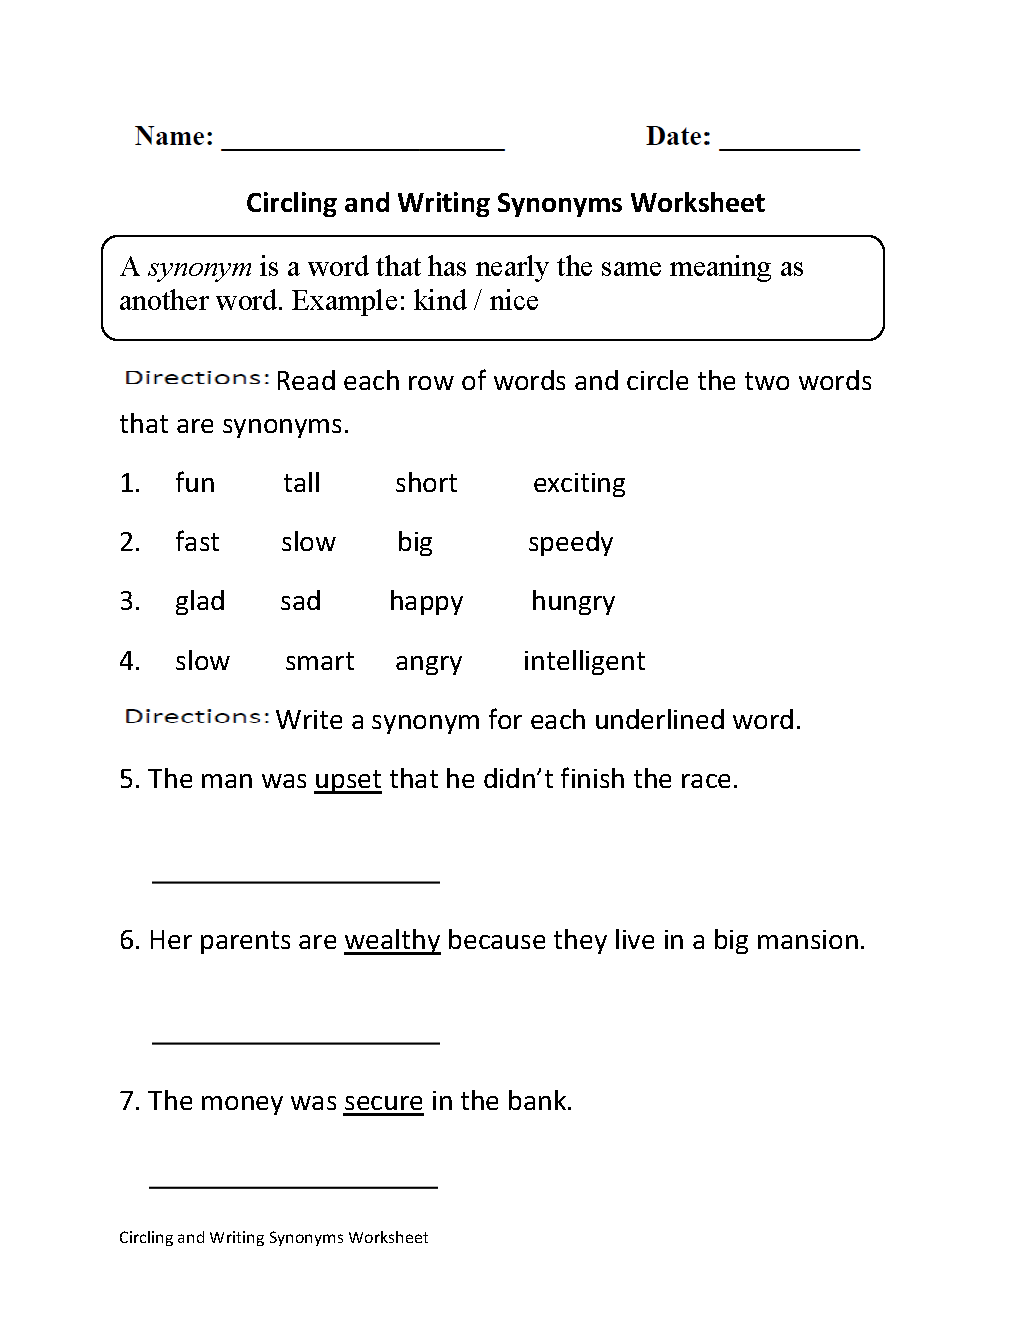 medium resolution of Englishlinx.com   Synonyms Worksheets   Synonym worksheet